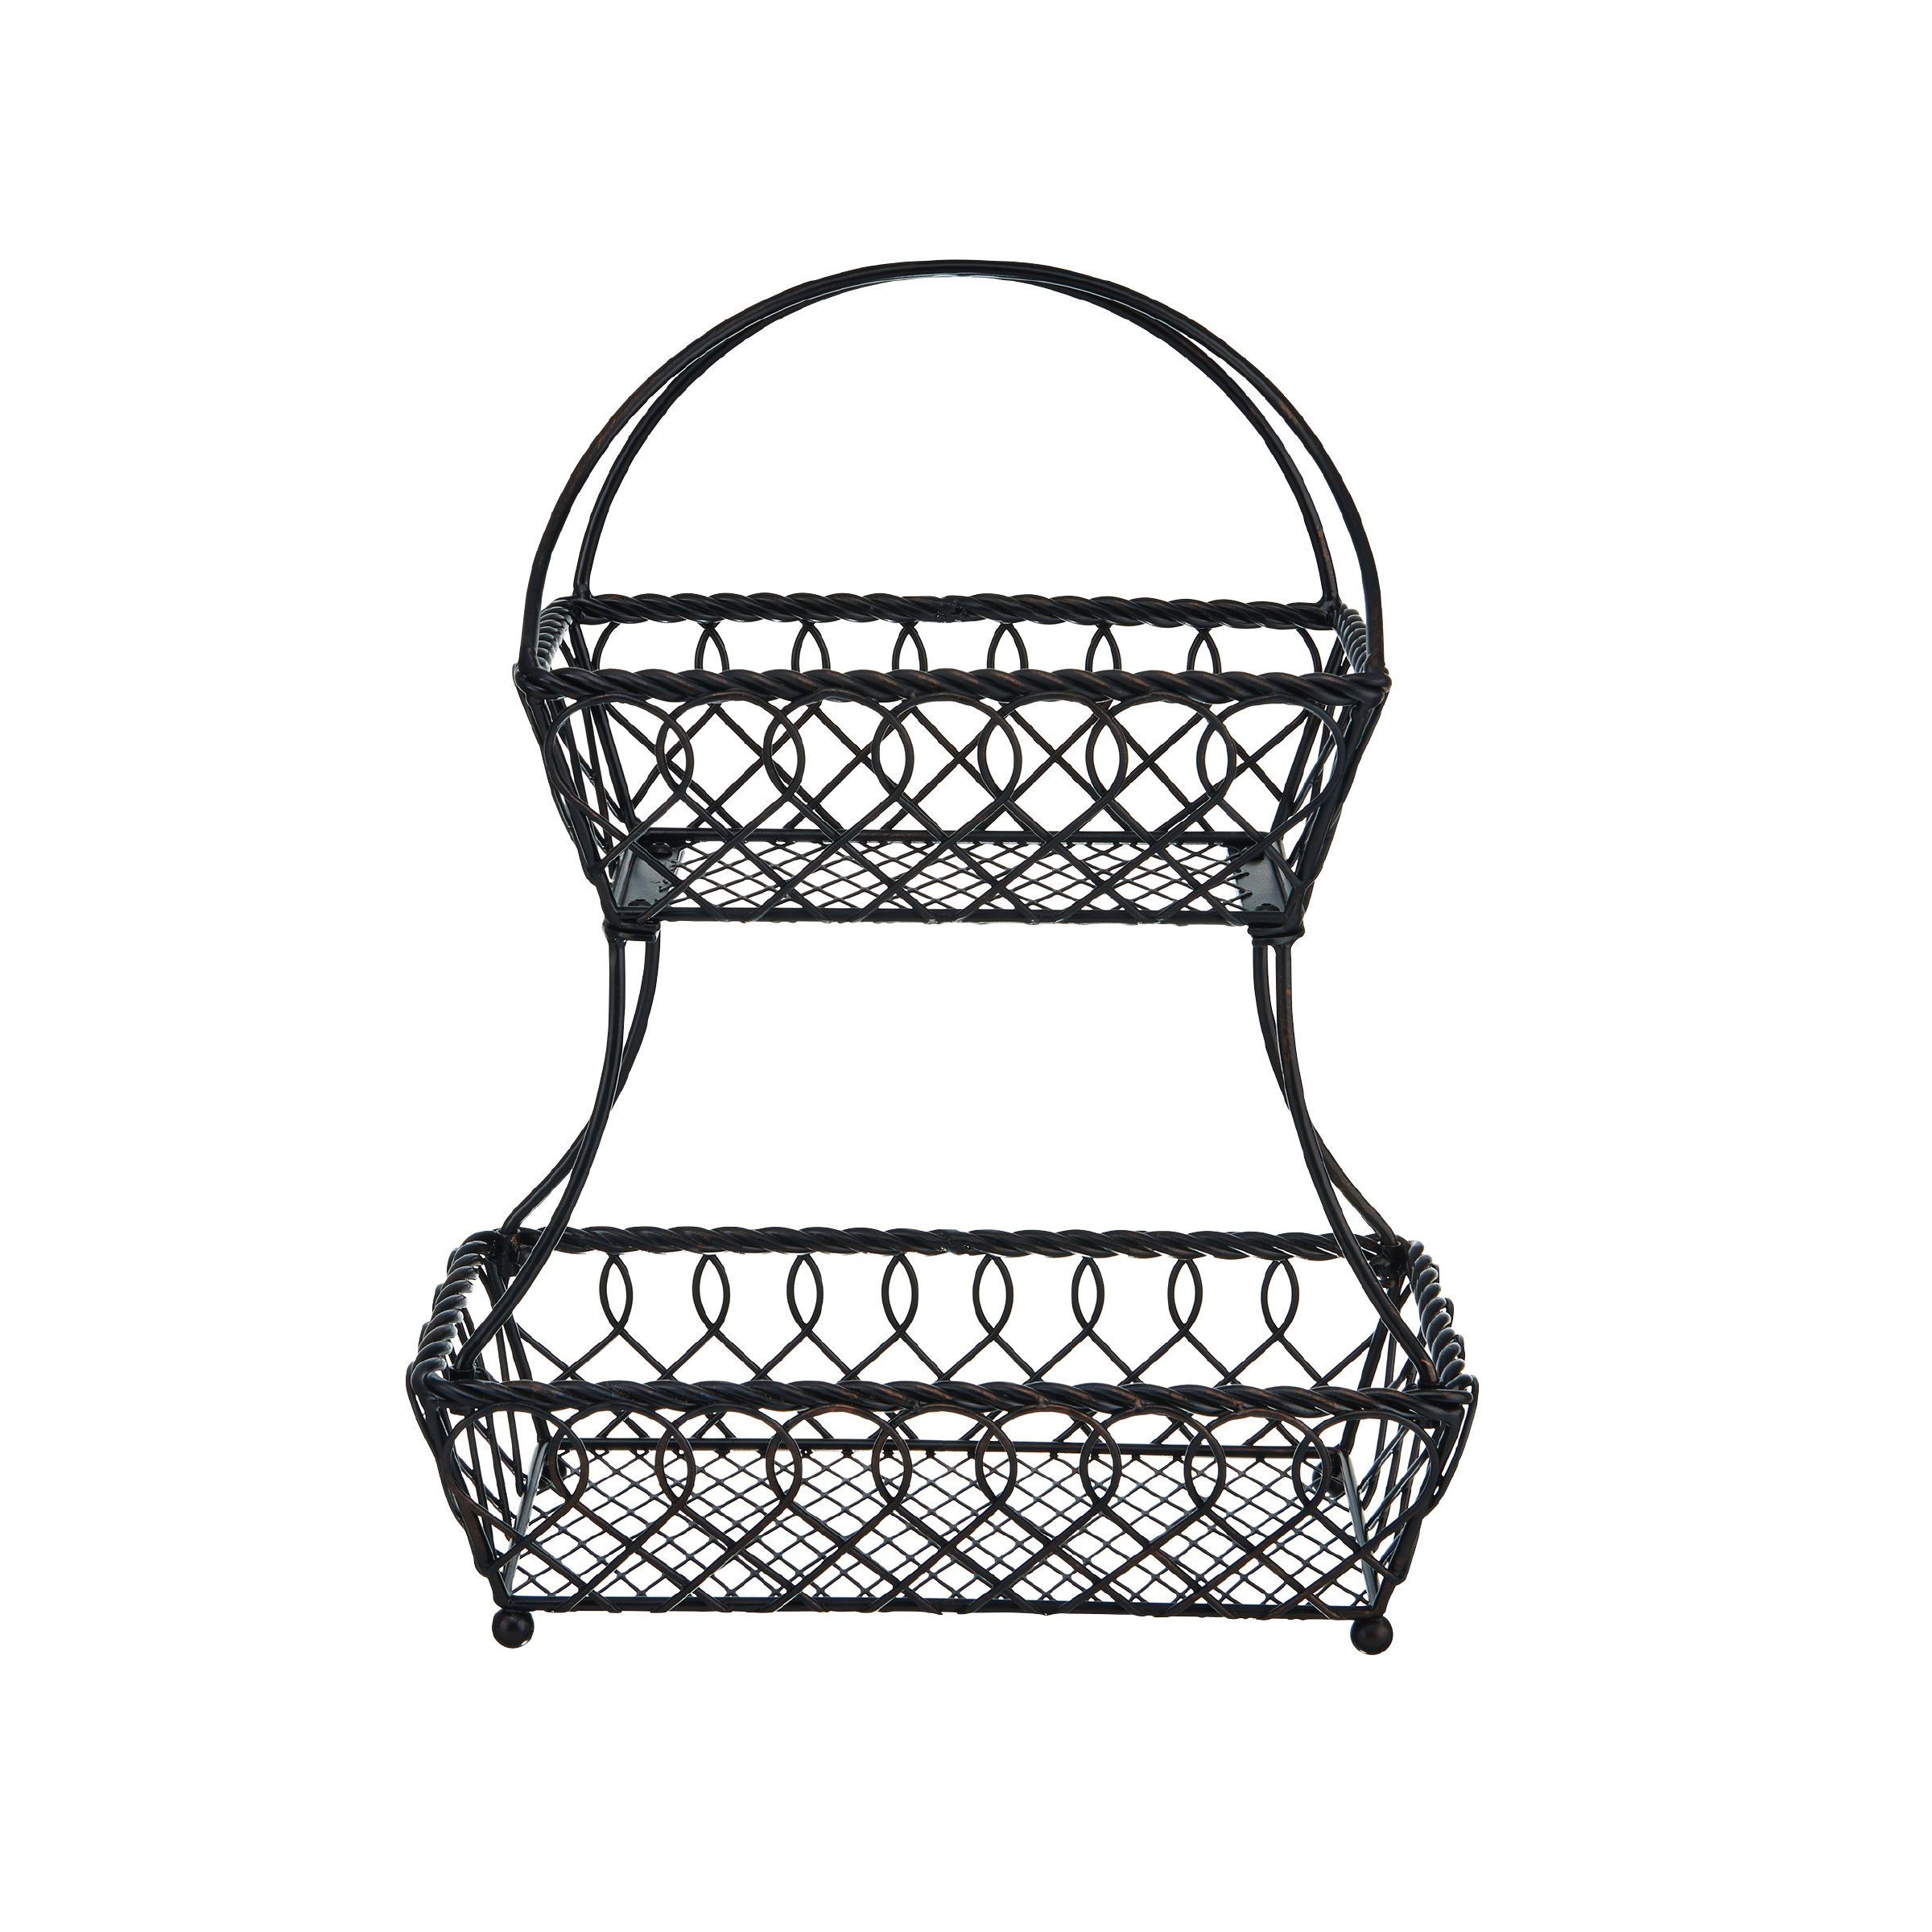 Gourmet Basics by Mikasa 5169089 Loop and Lattice 2 Metal Fruit Storage Basket, 2 Tier, Antique Black